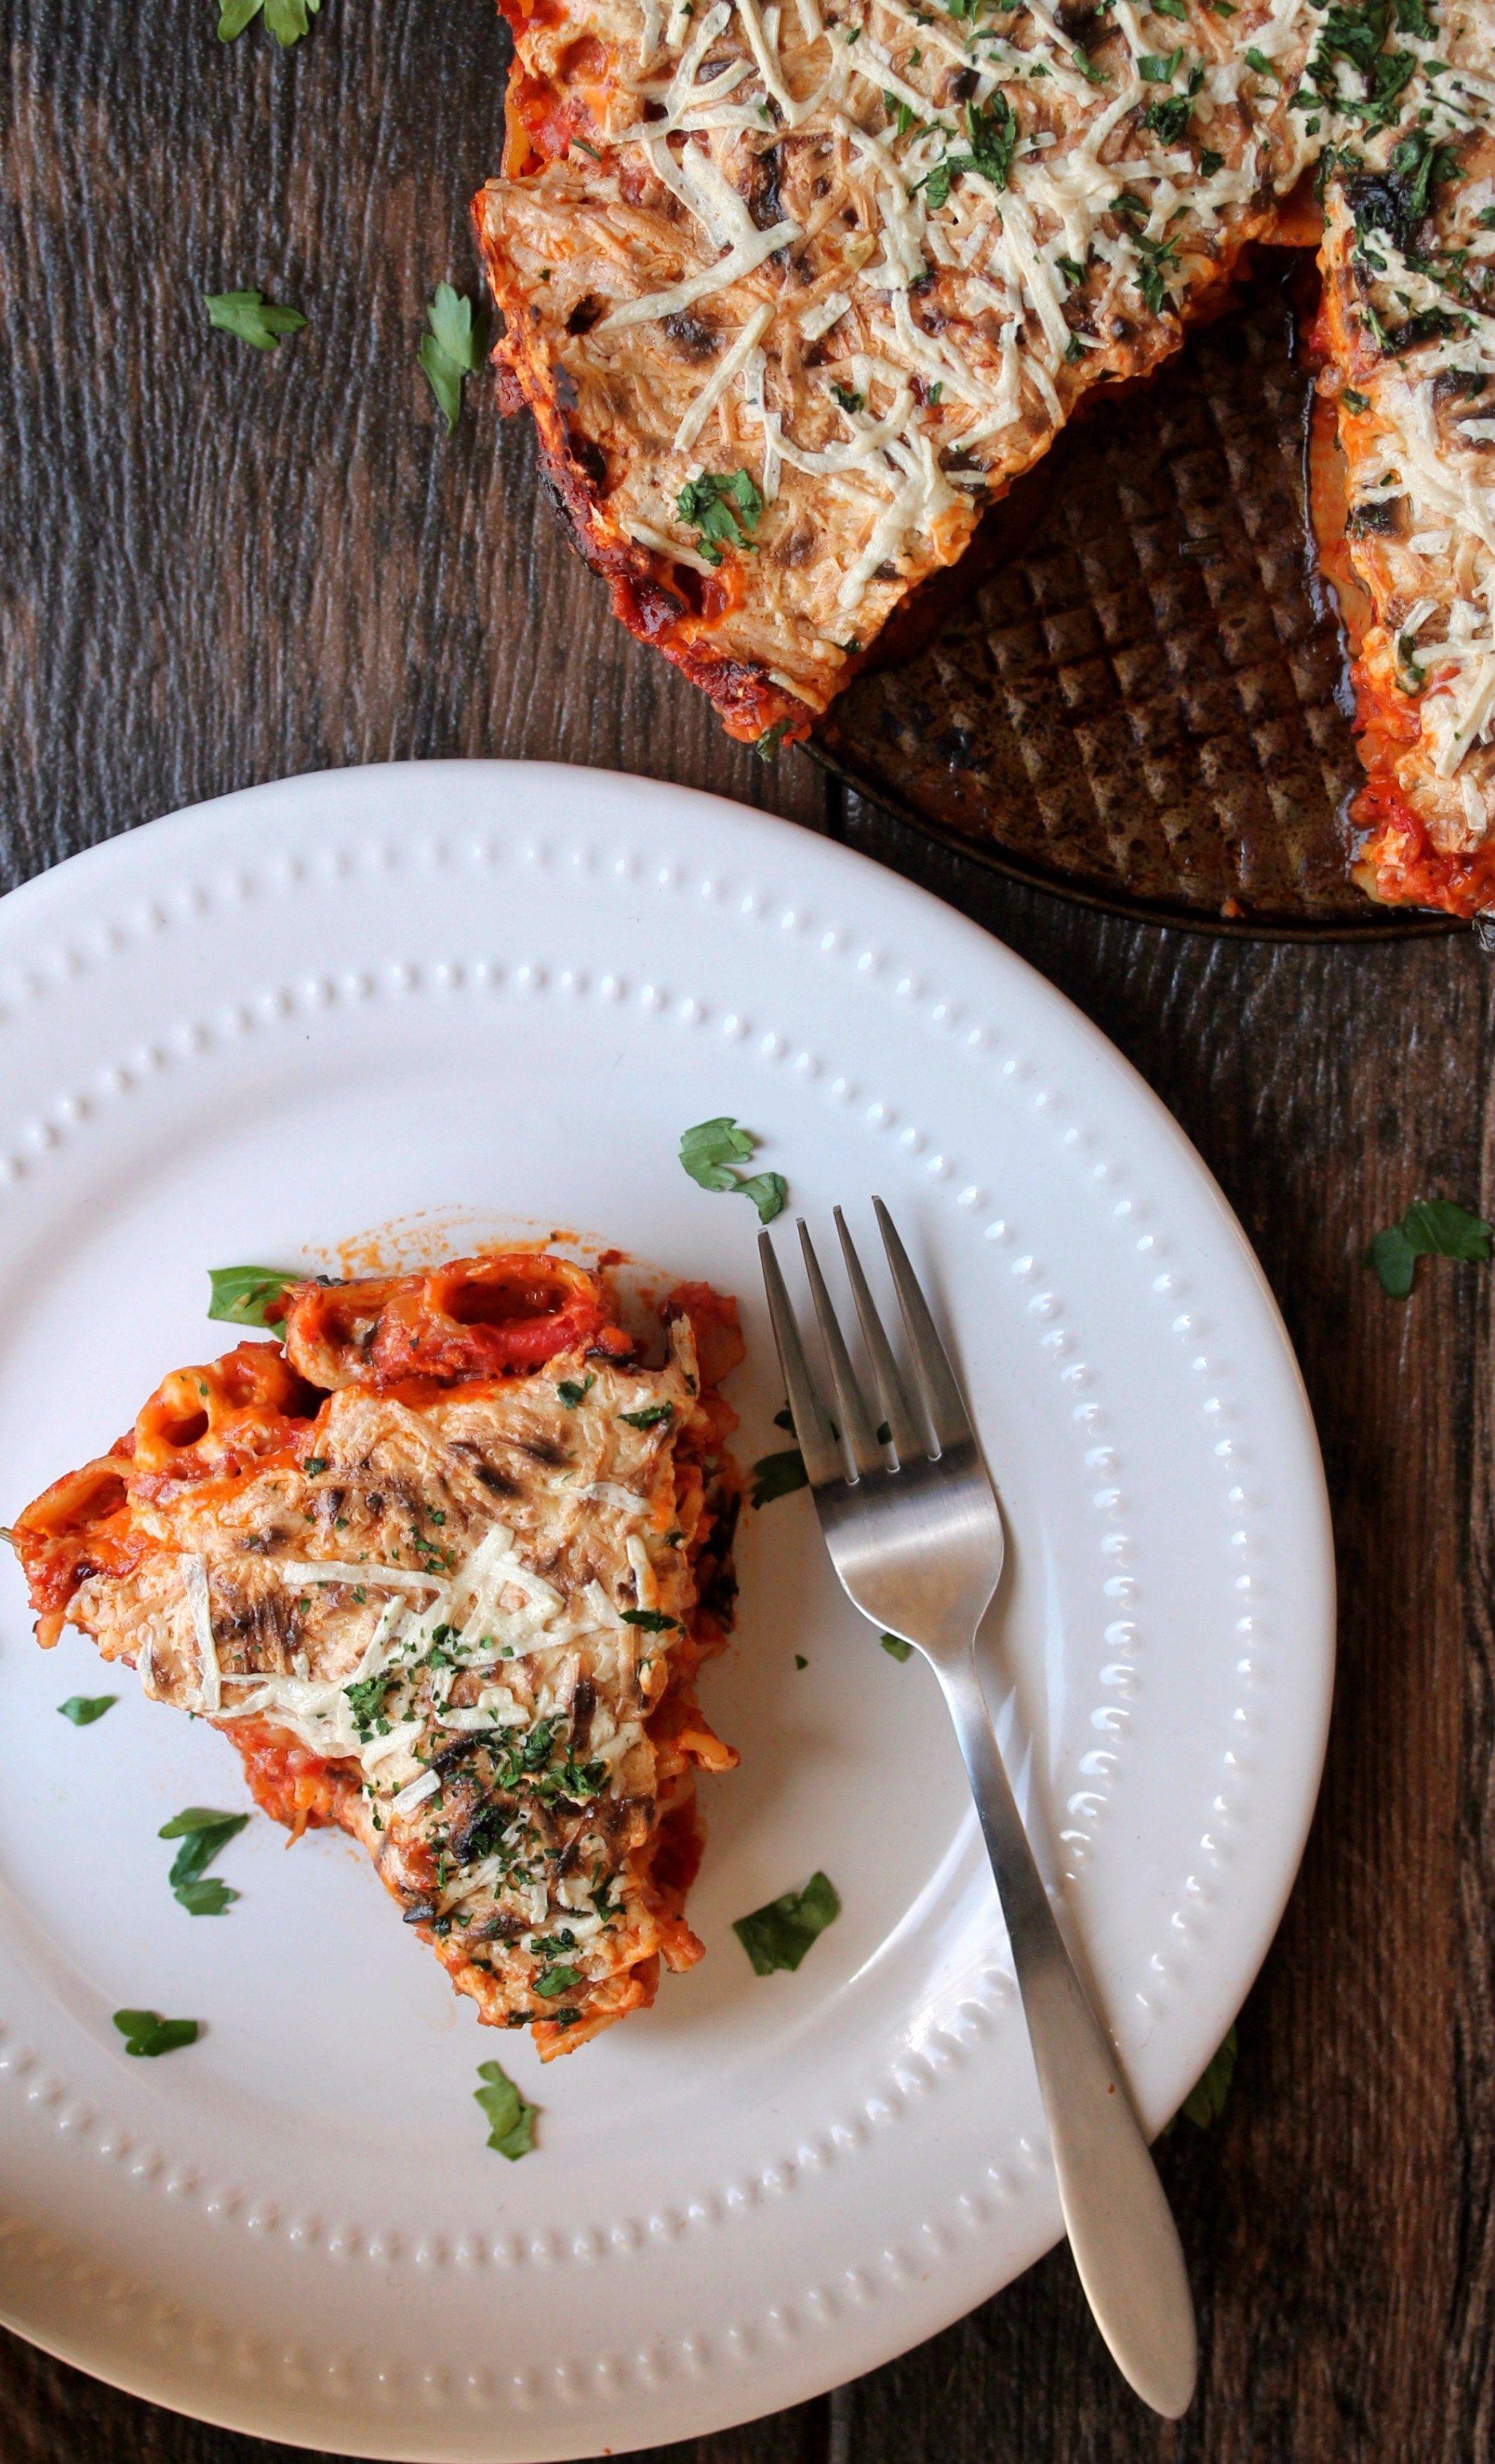 Rigatoni Pasta With Spicy Pomodoro Sauce Vegan